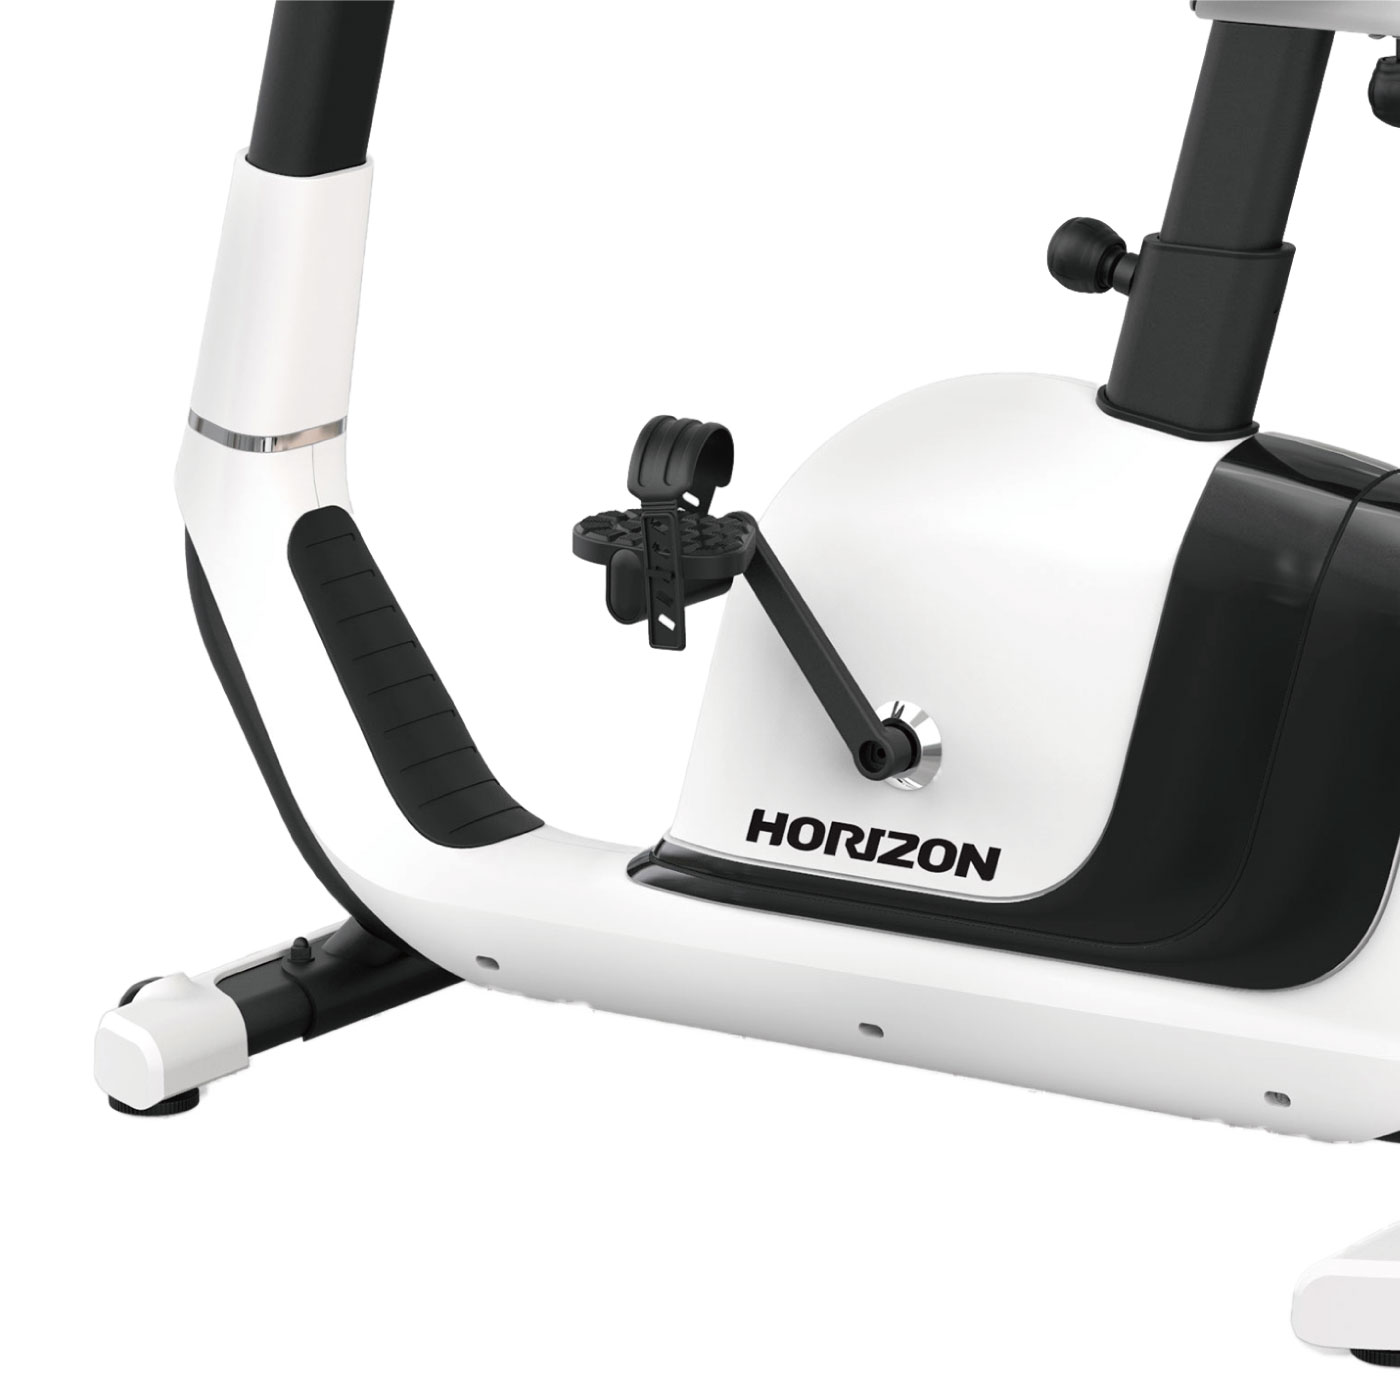 Comfort5/家庭用アップライトバイク〈家庭用HORIZON〉《ジョンソンヘルステック》